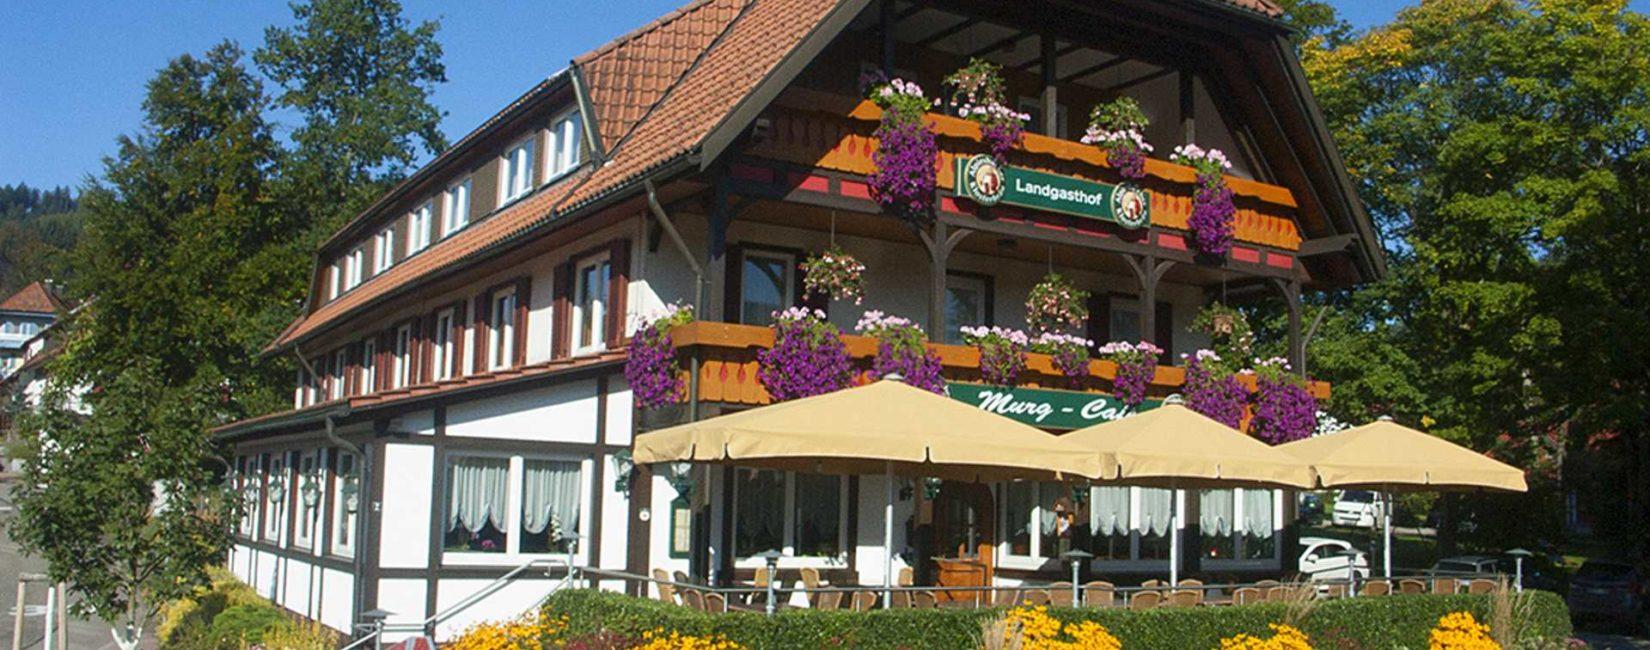 Gasthof | Pension | Murg-Café